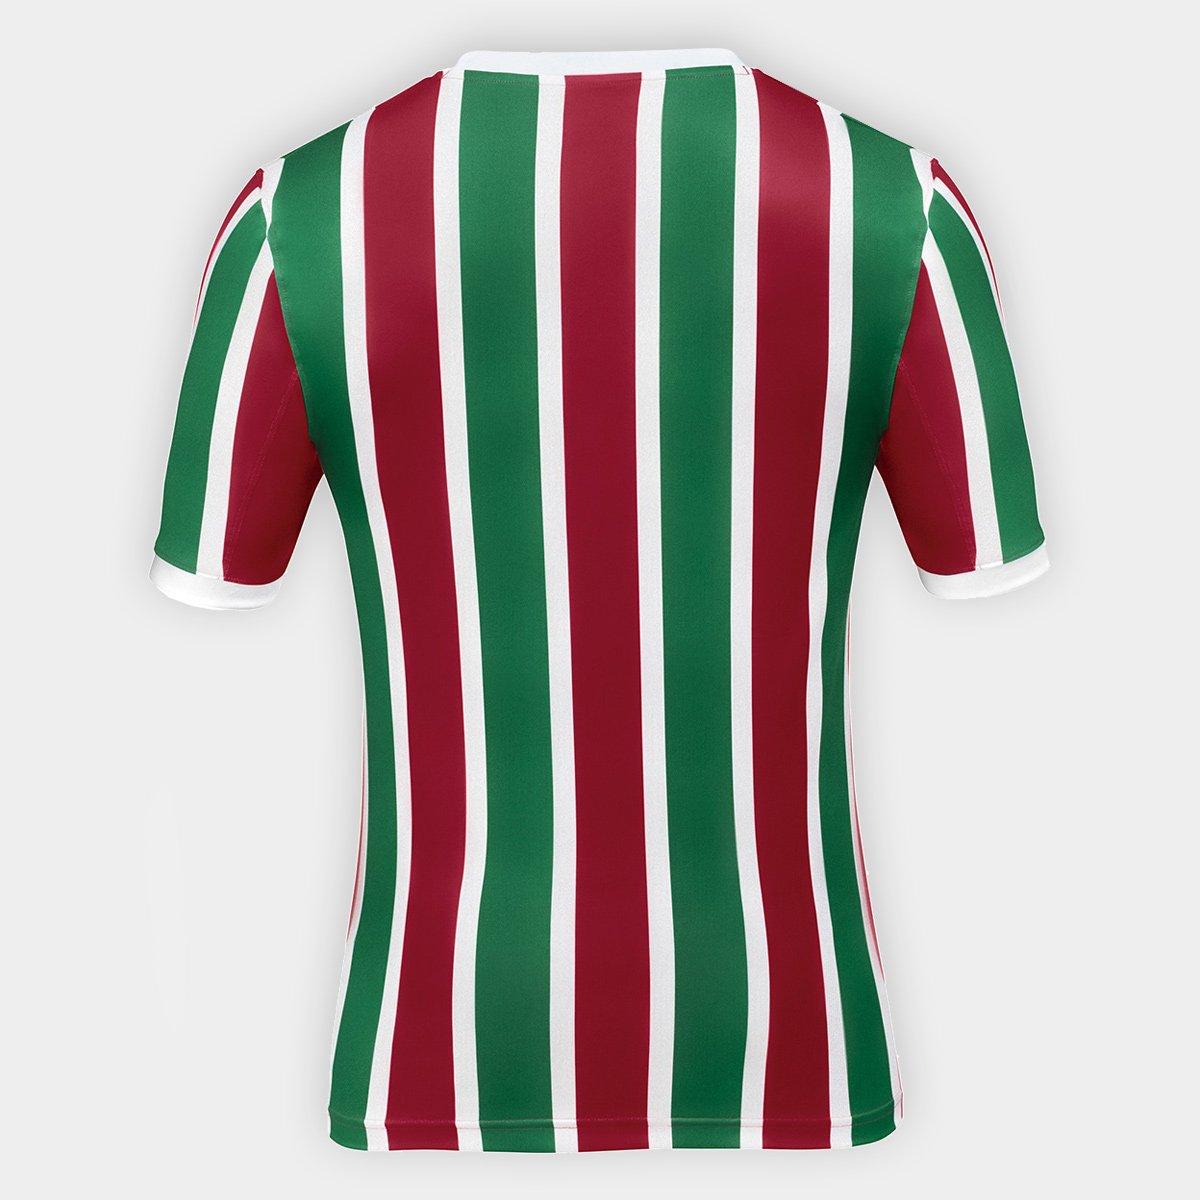 5ee08f87cc Camisa Fluminense I 17 18 s nº Torcedor Under Armour Masculina ...